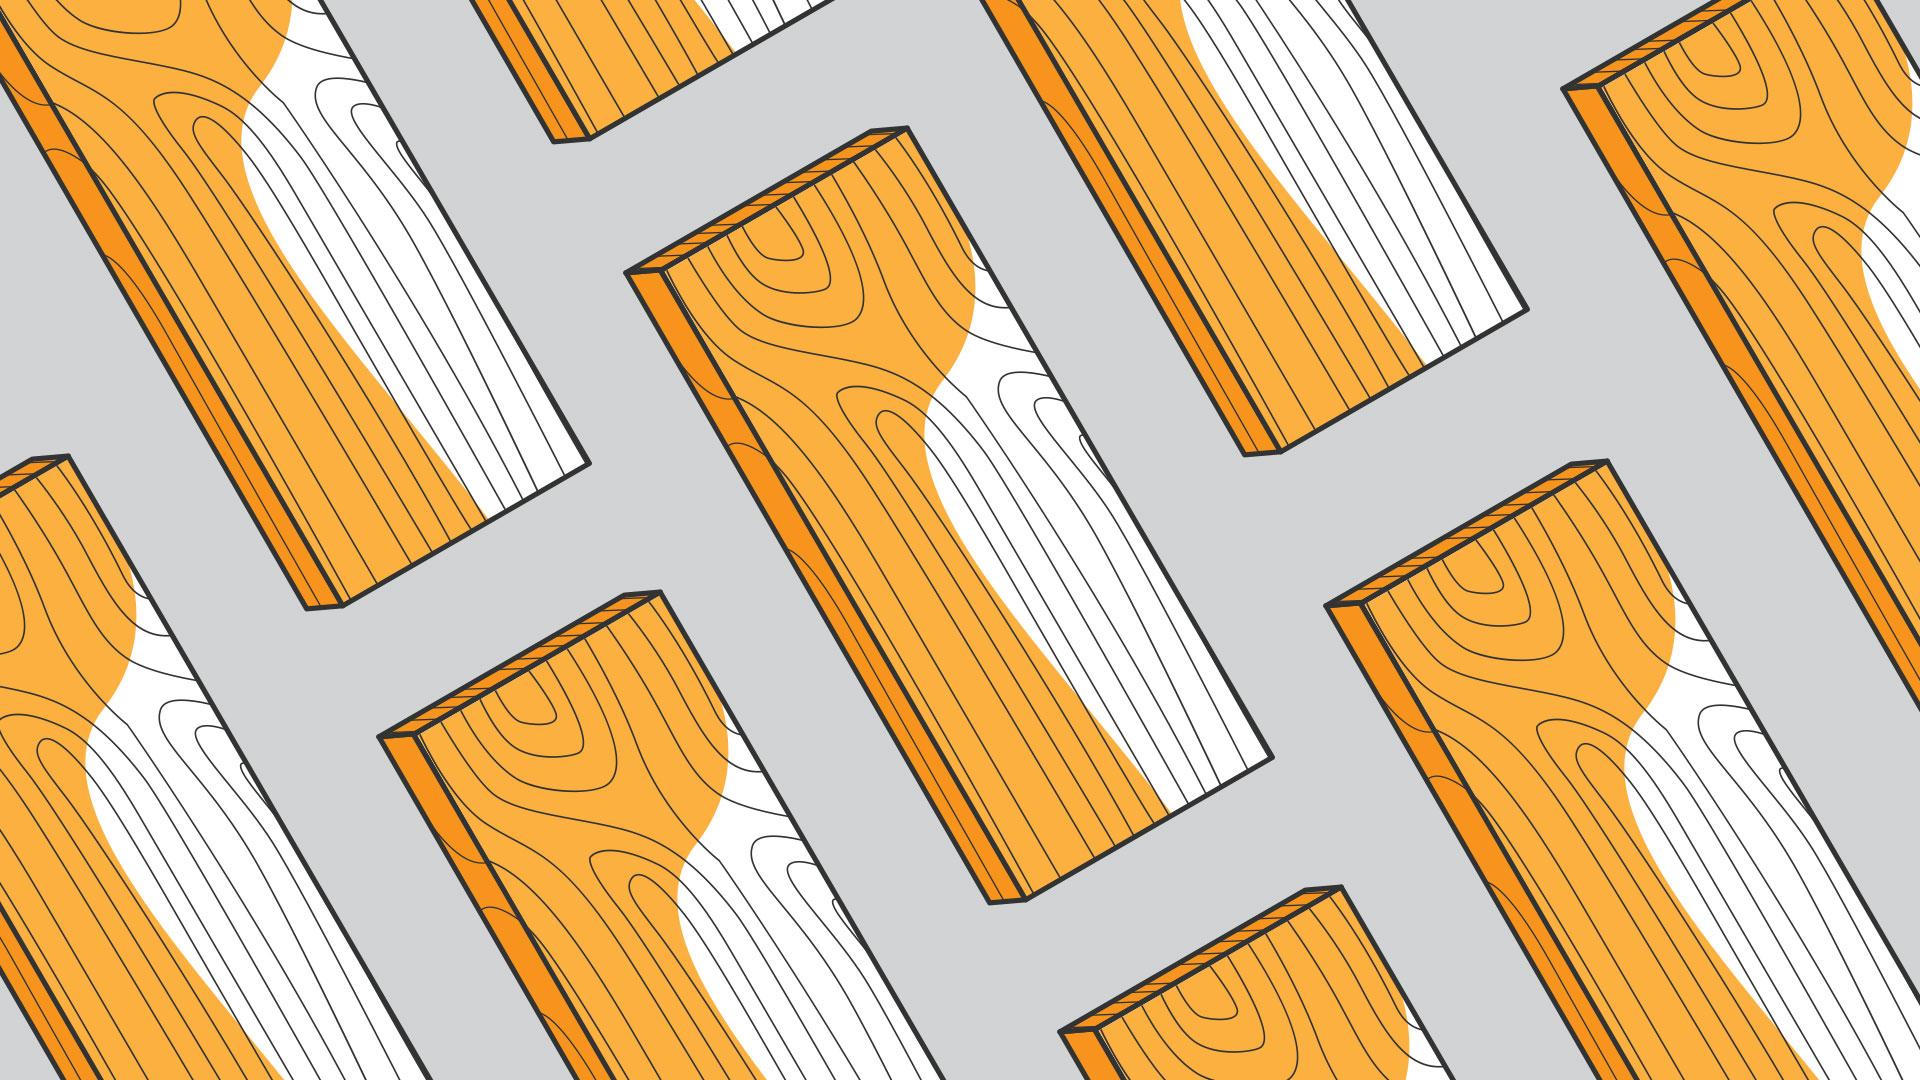 Material illustration: Wood